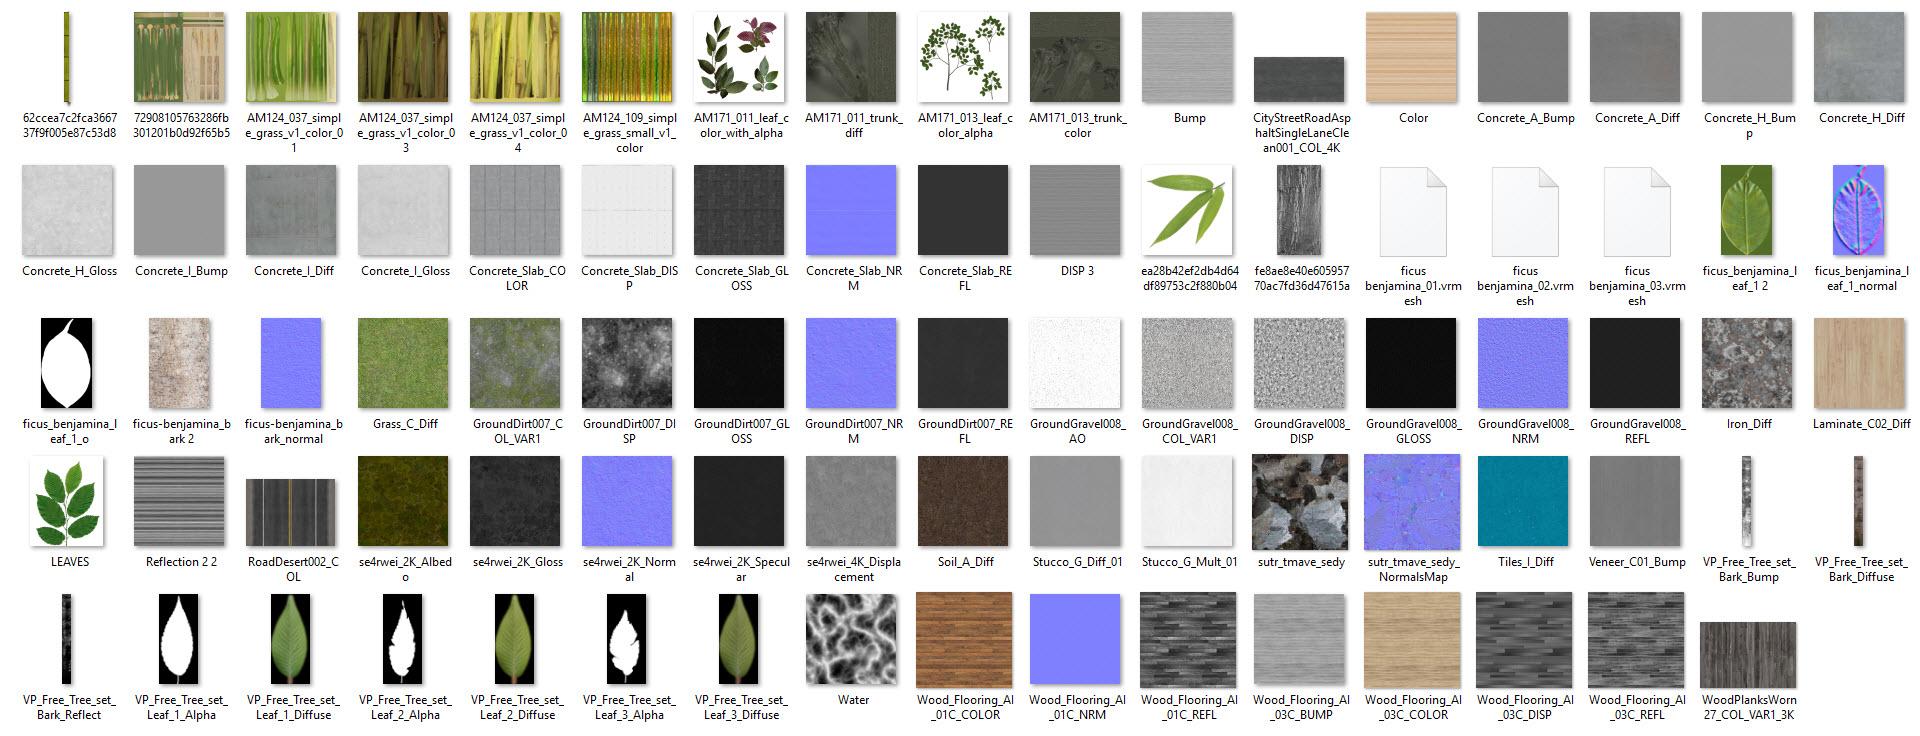 Files 3.jpg